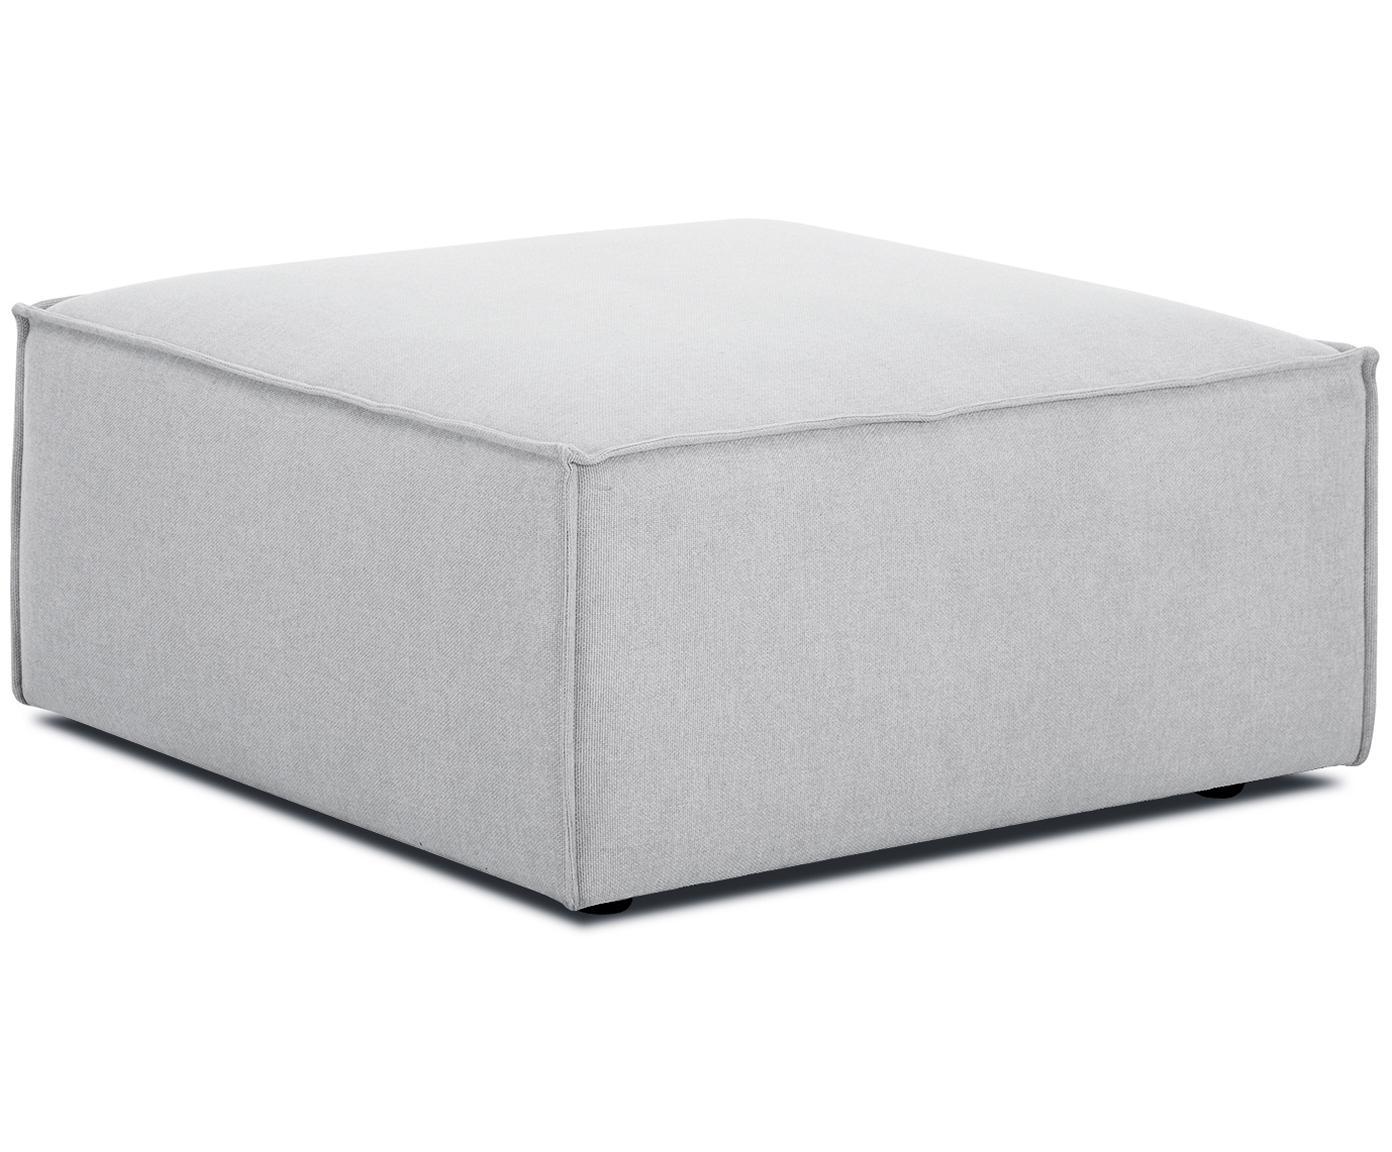 Sofa-Hocker Lennon, Bezug: Polyester 35.000 Scheuert, Gestell: Massives Kiefernholz, Spe, Webstoff Hellgrau, 88 x 43 cm